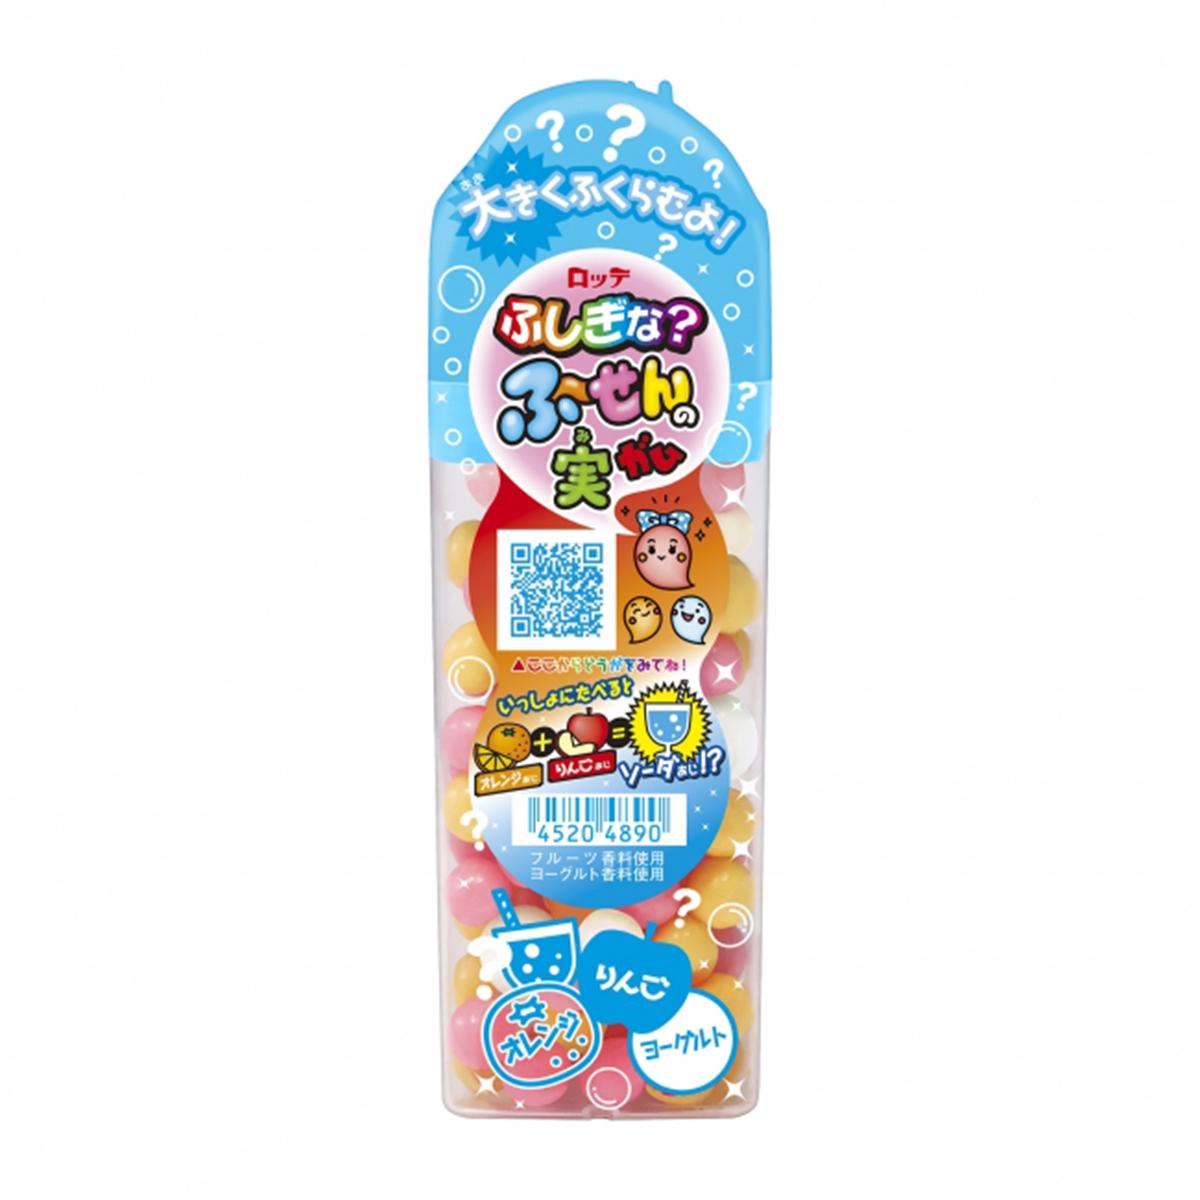 Chiclete Japonês Baloon Fusen Sabor Maça, Iorgurte e Laranja Lotte - 35g